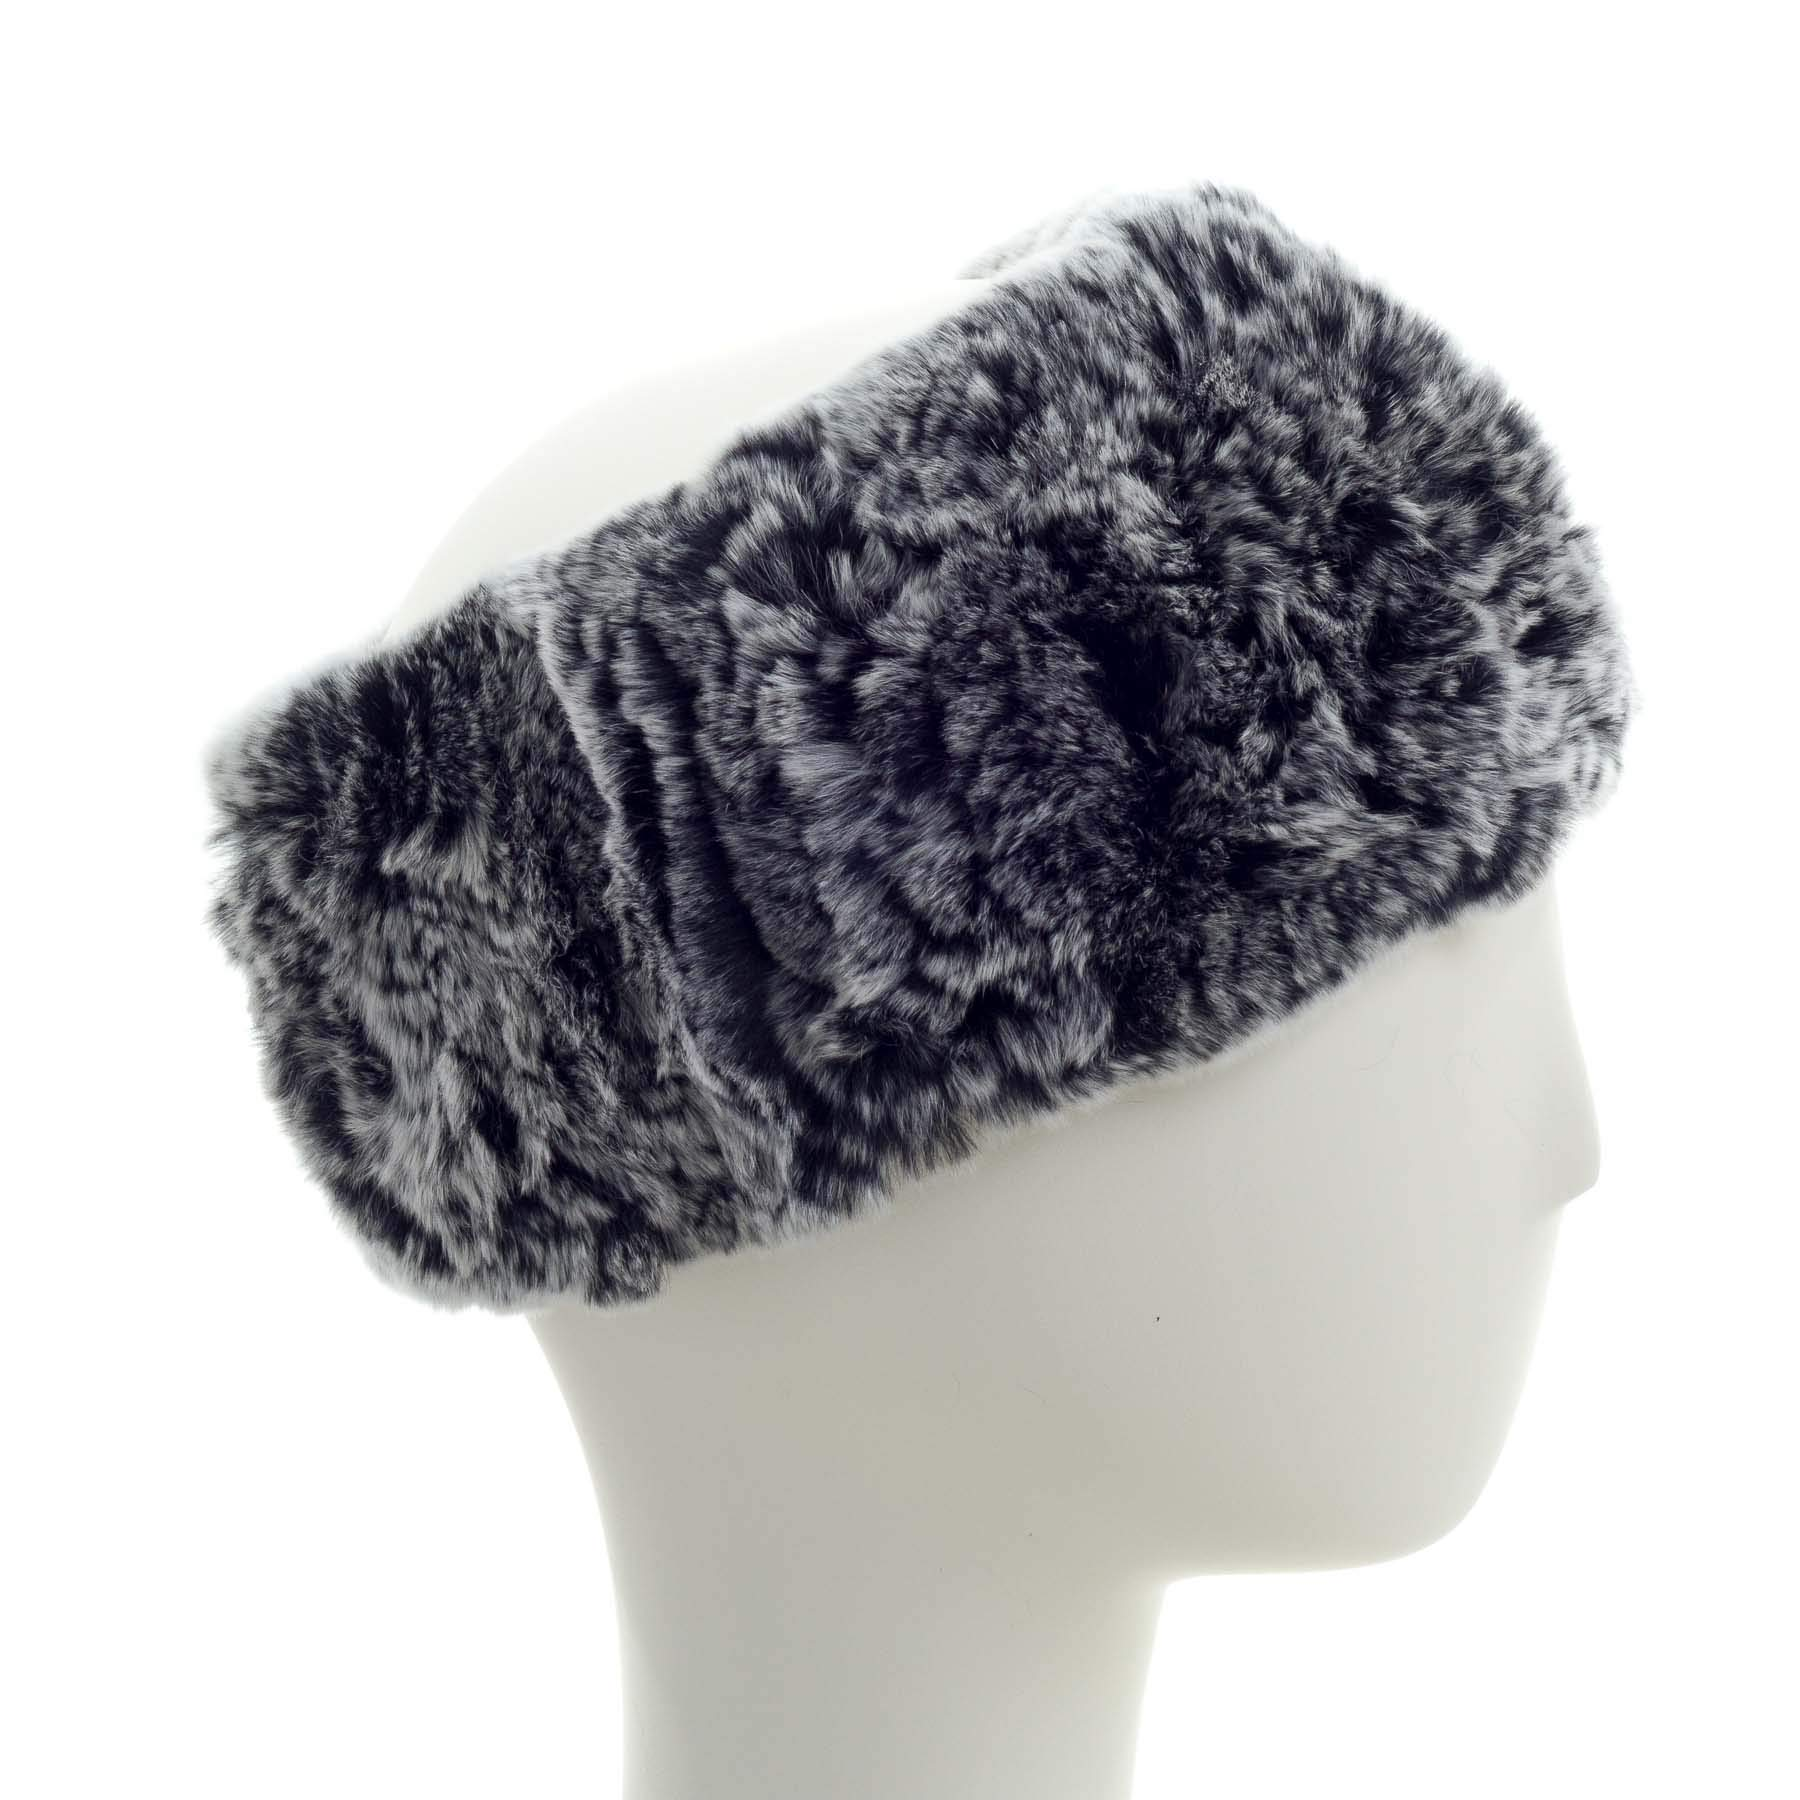 Surell Rex Rabbit Textile Knit Headband - Winter Scarf Ear Warmers - Luxury Gift (Black Frost)